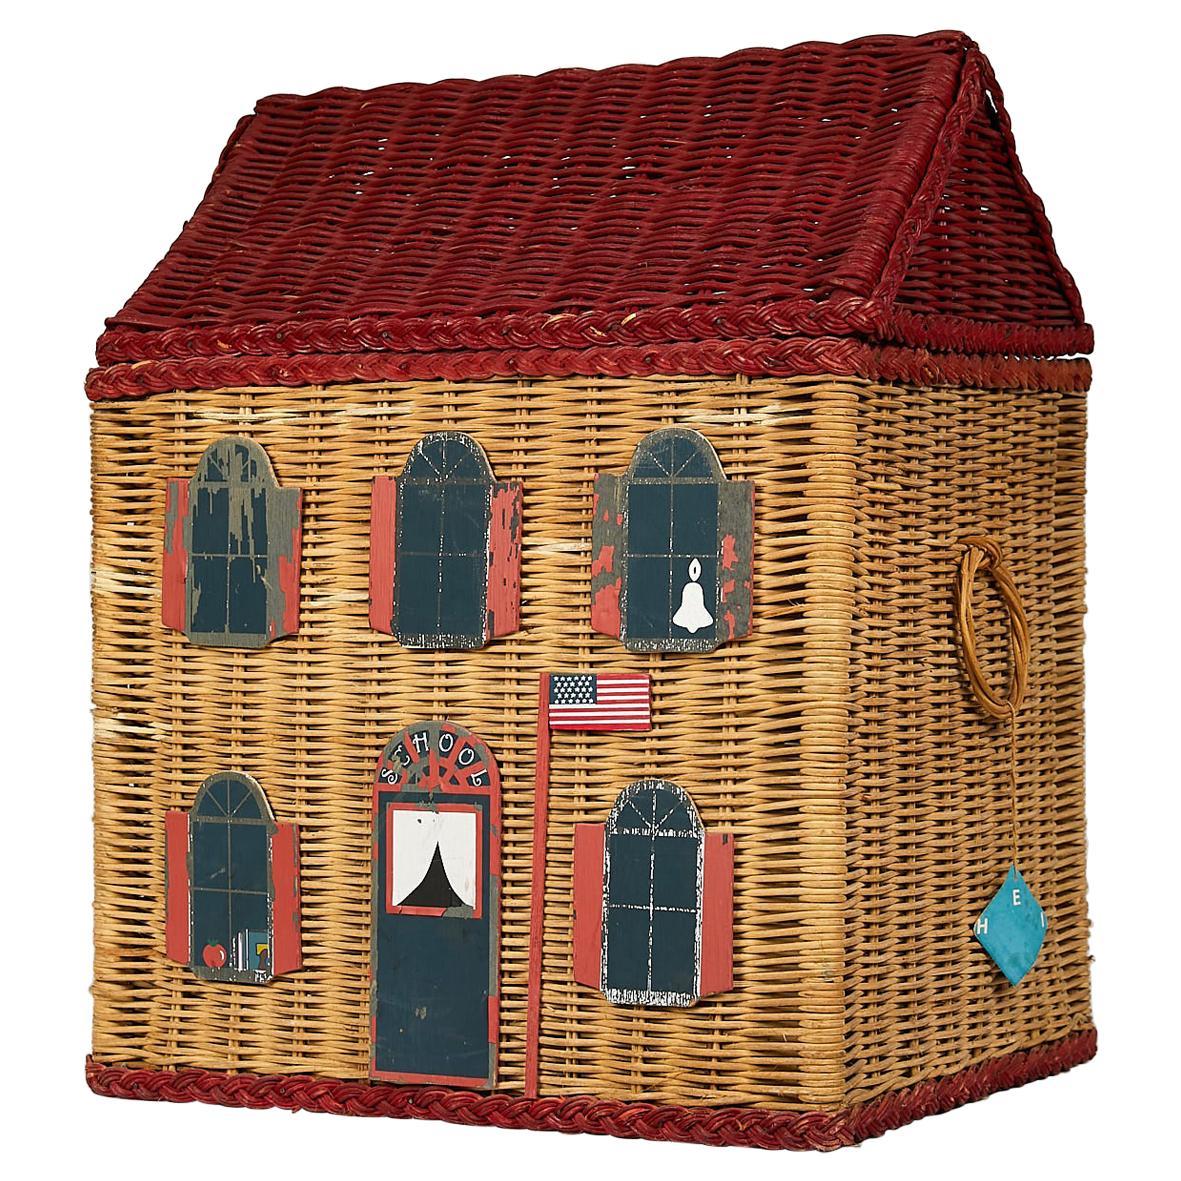 Vintage Schoolhouse Toy Box of Wicker